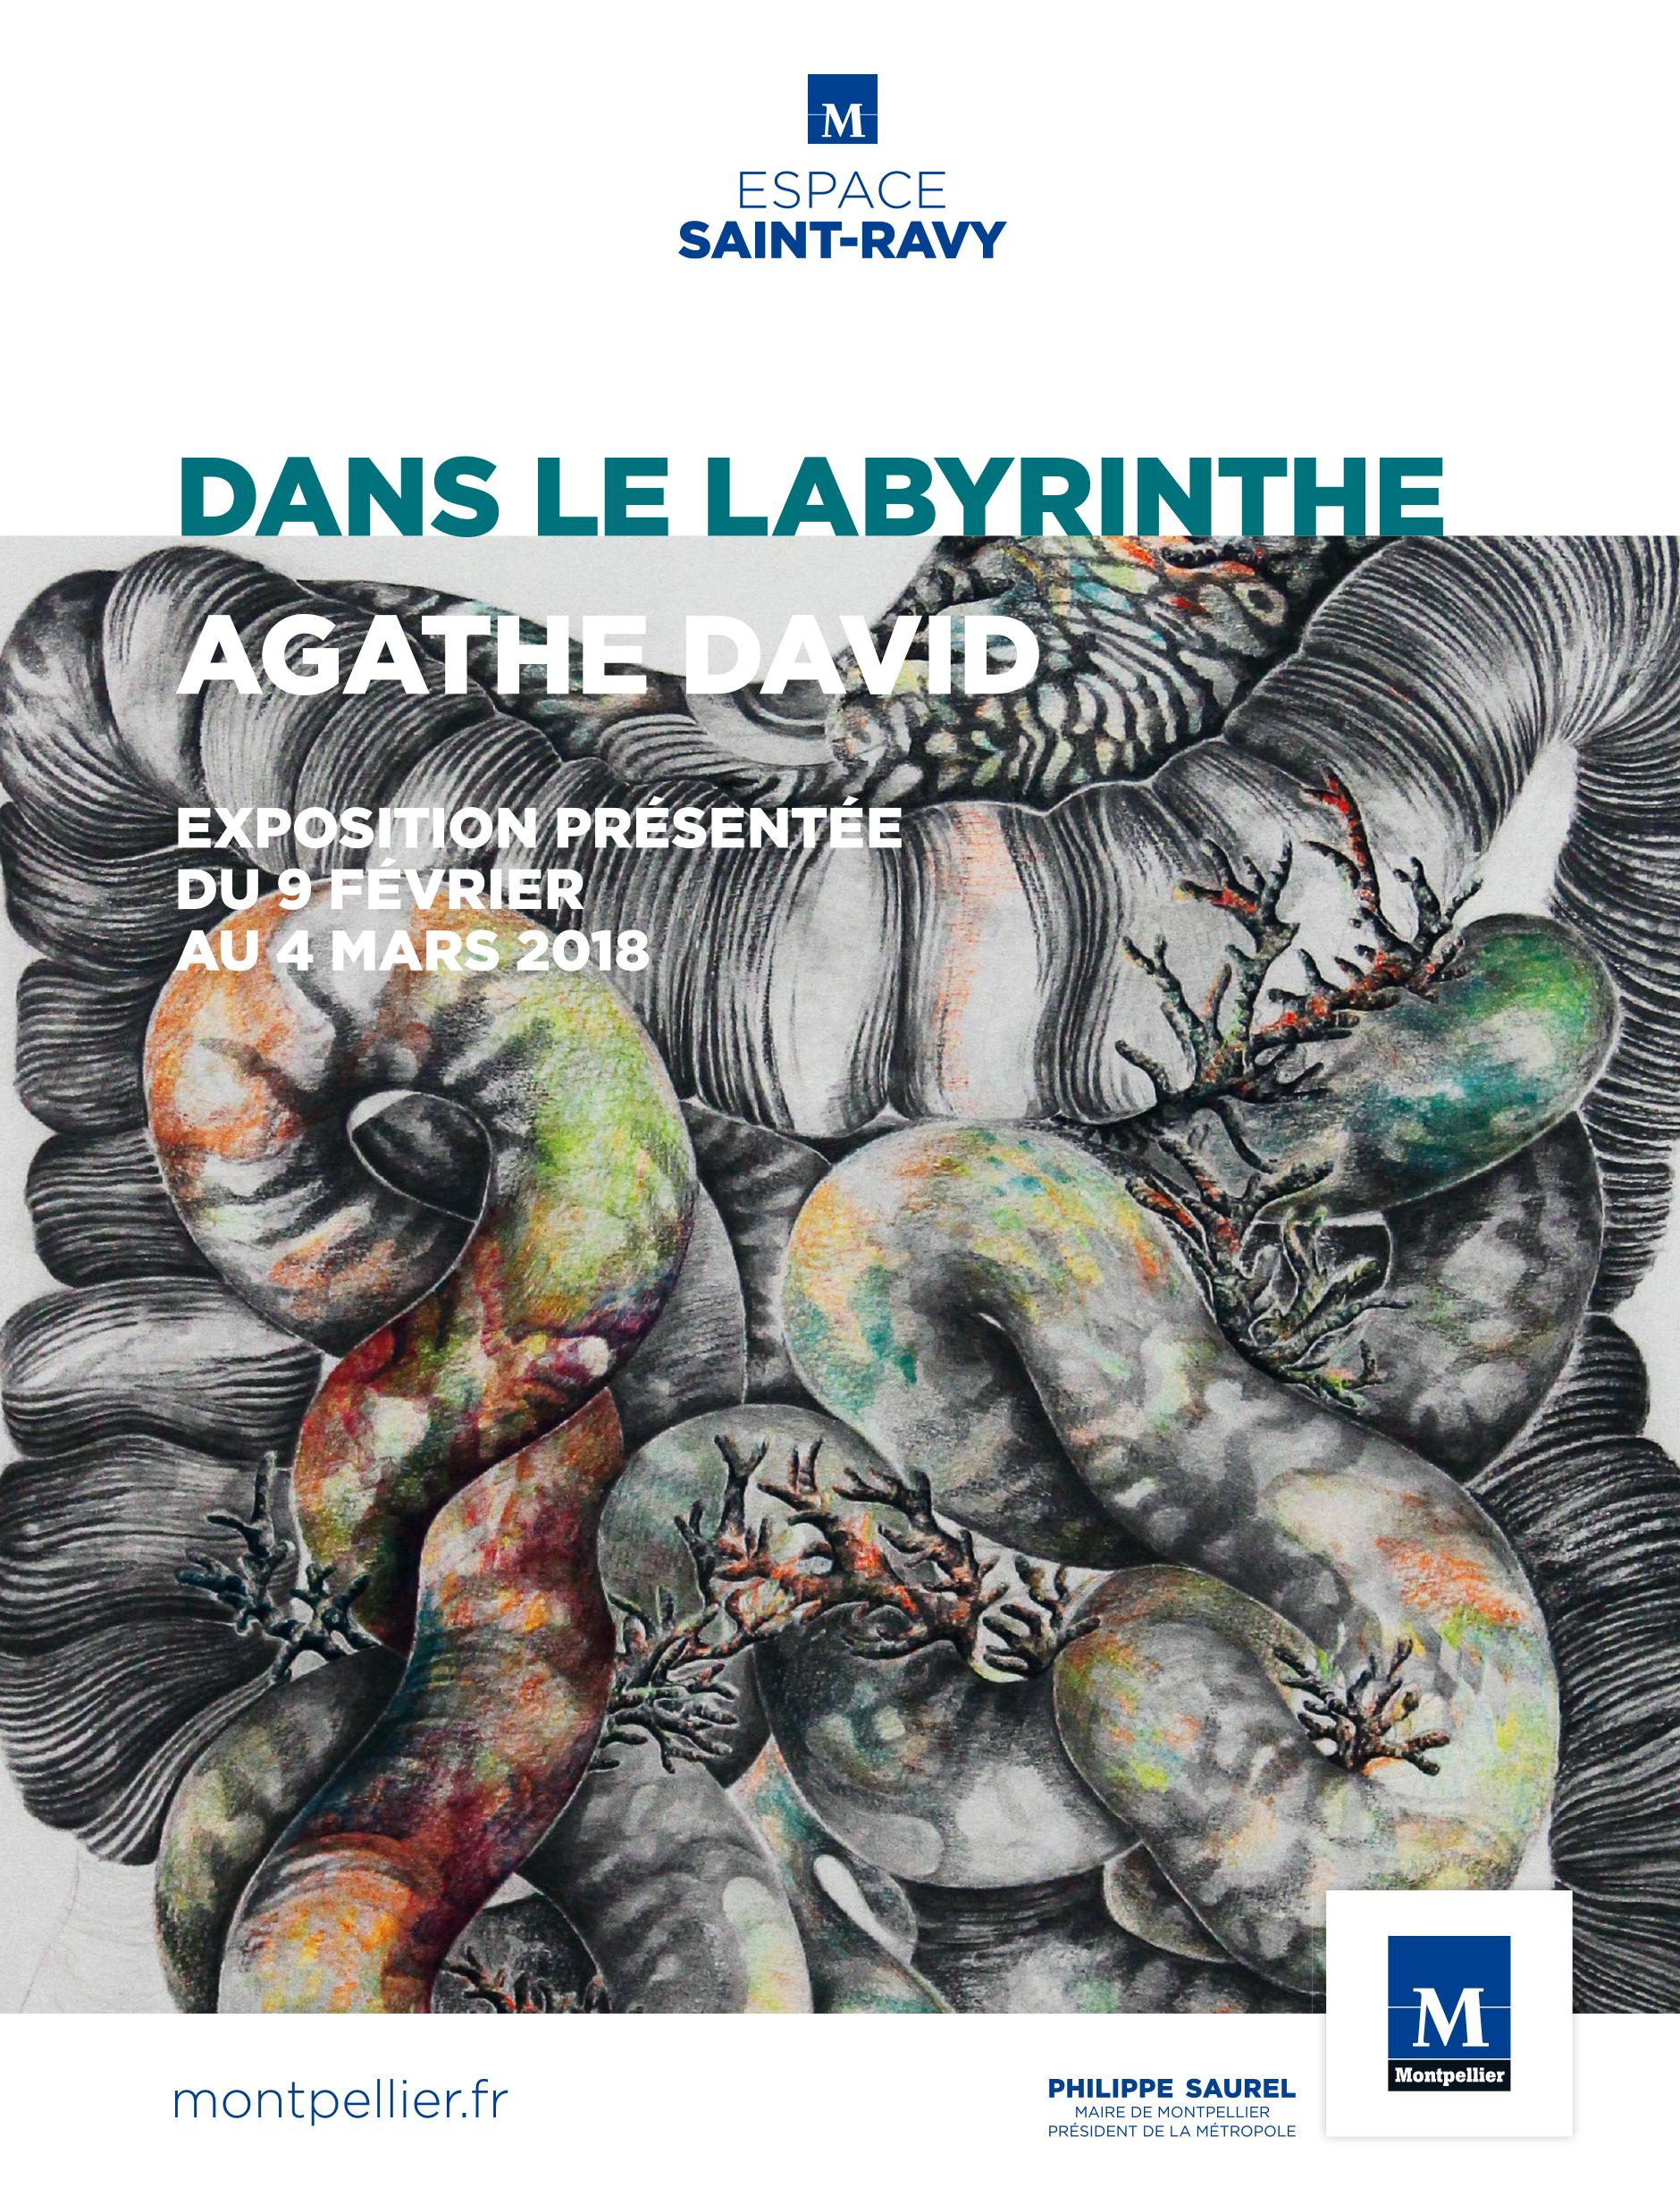 Agathe David